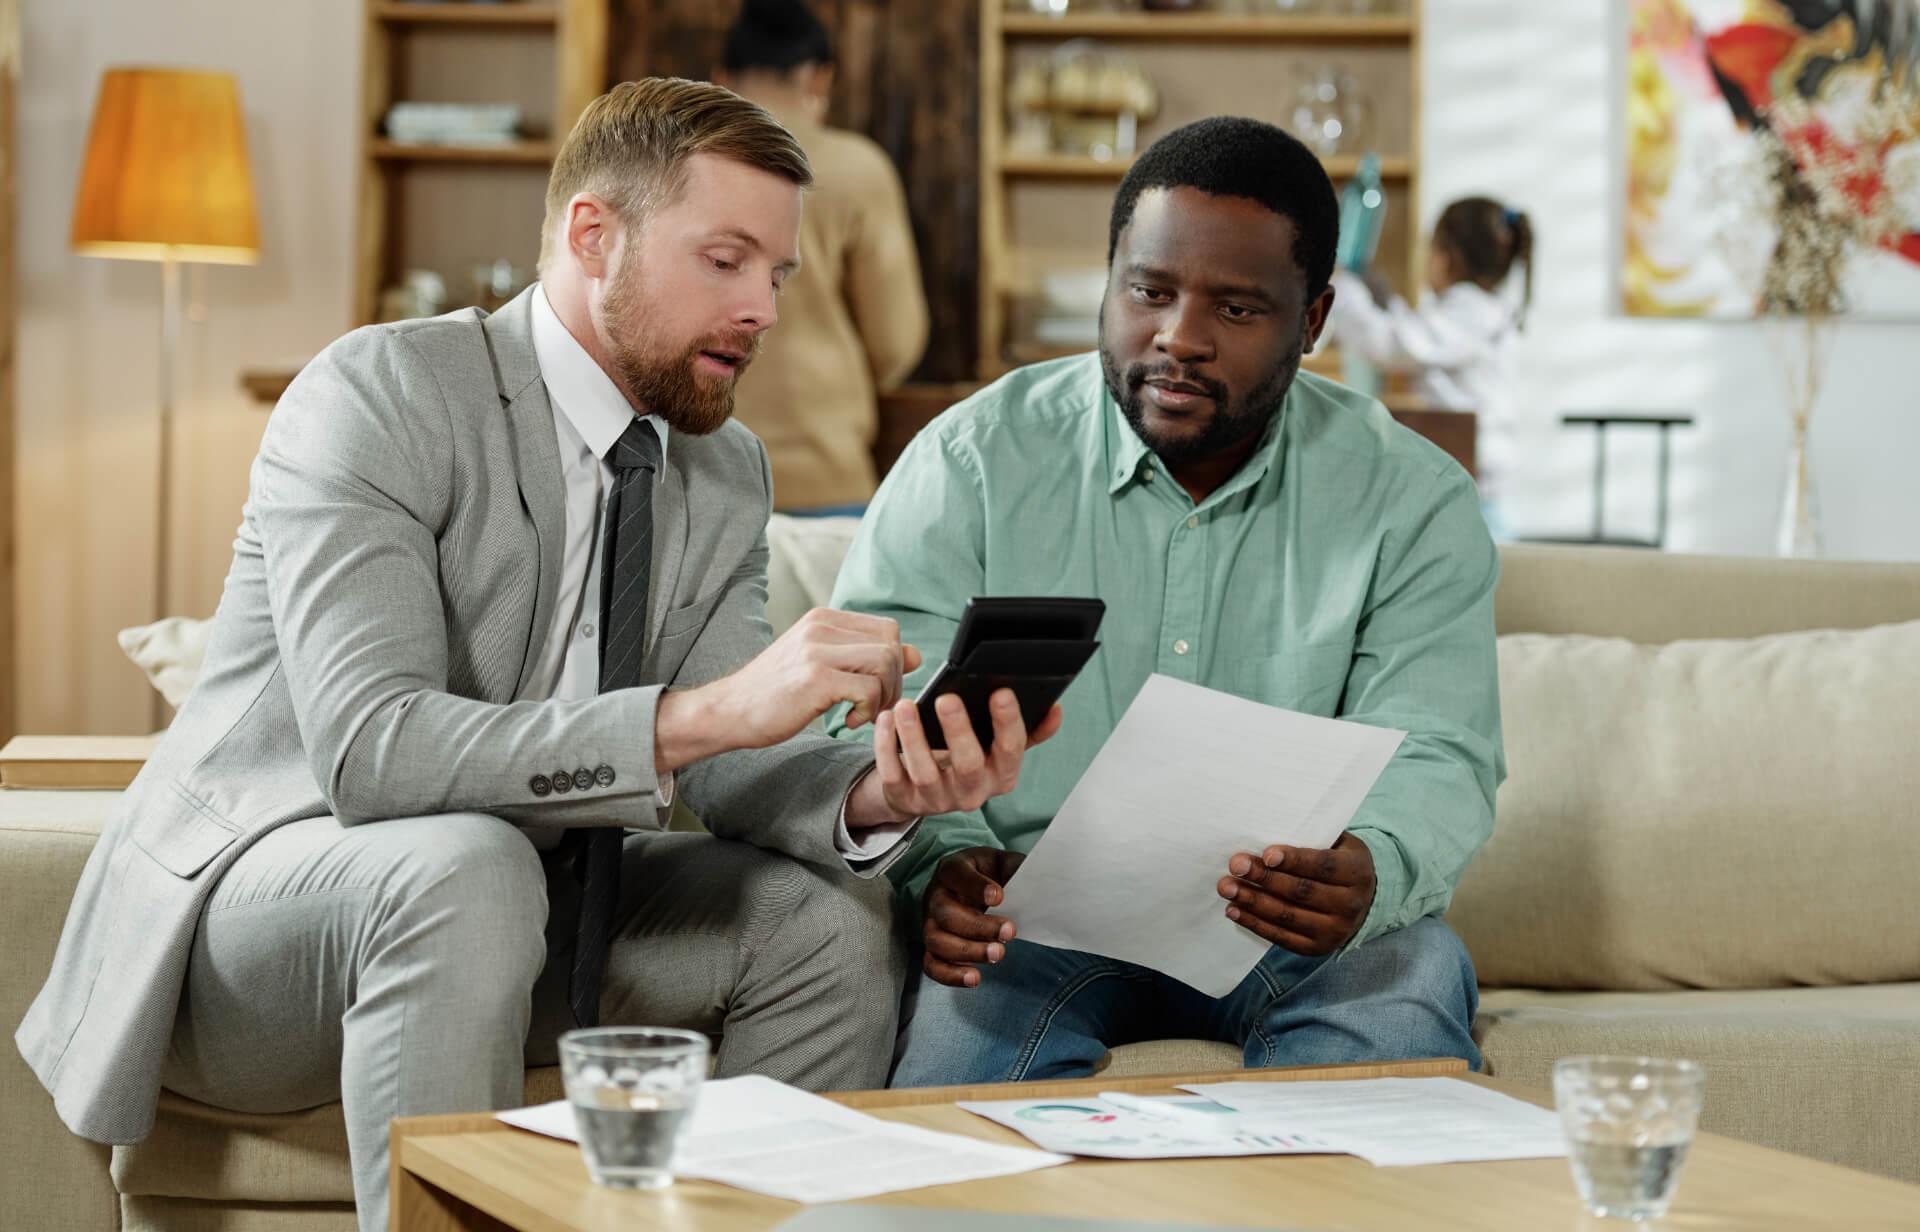 frais-gestion-portage-salarial-immobilier